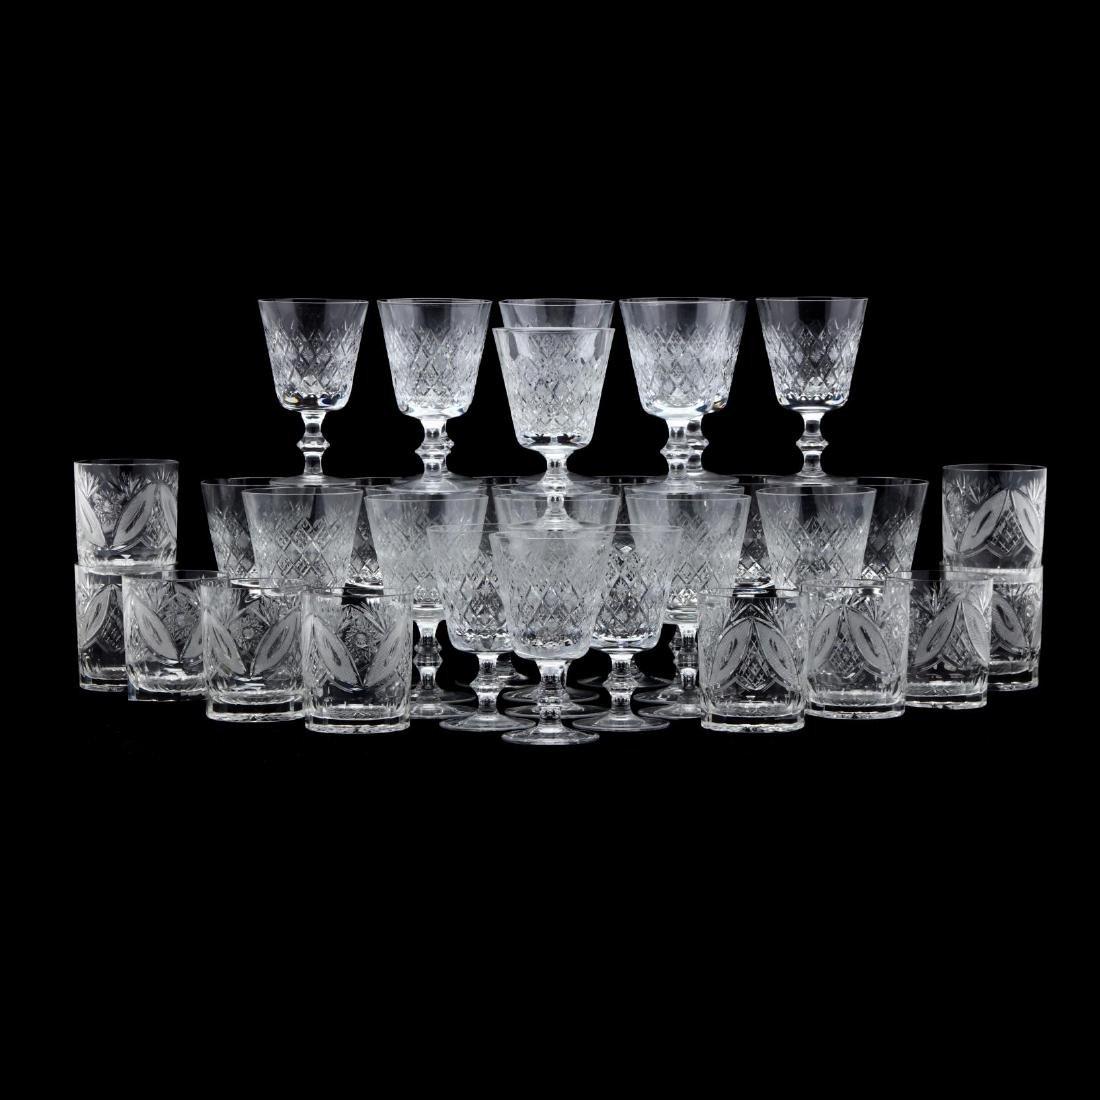 Large Group of Vintage Glass Stemware